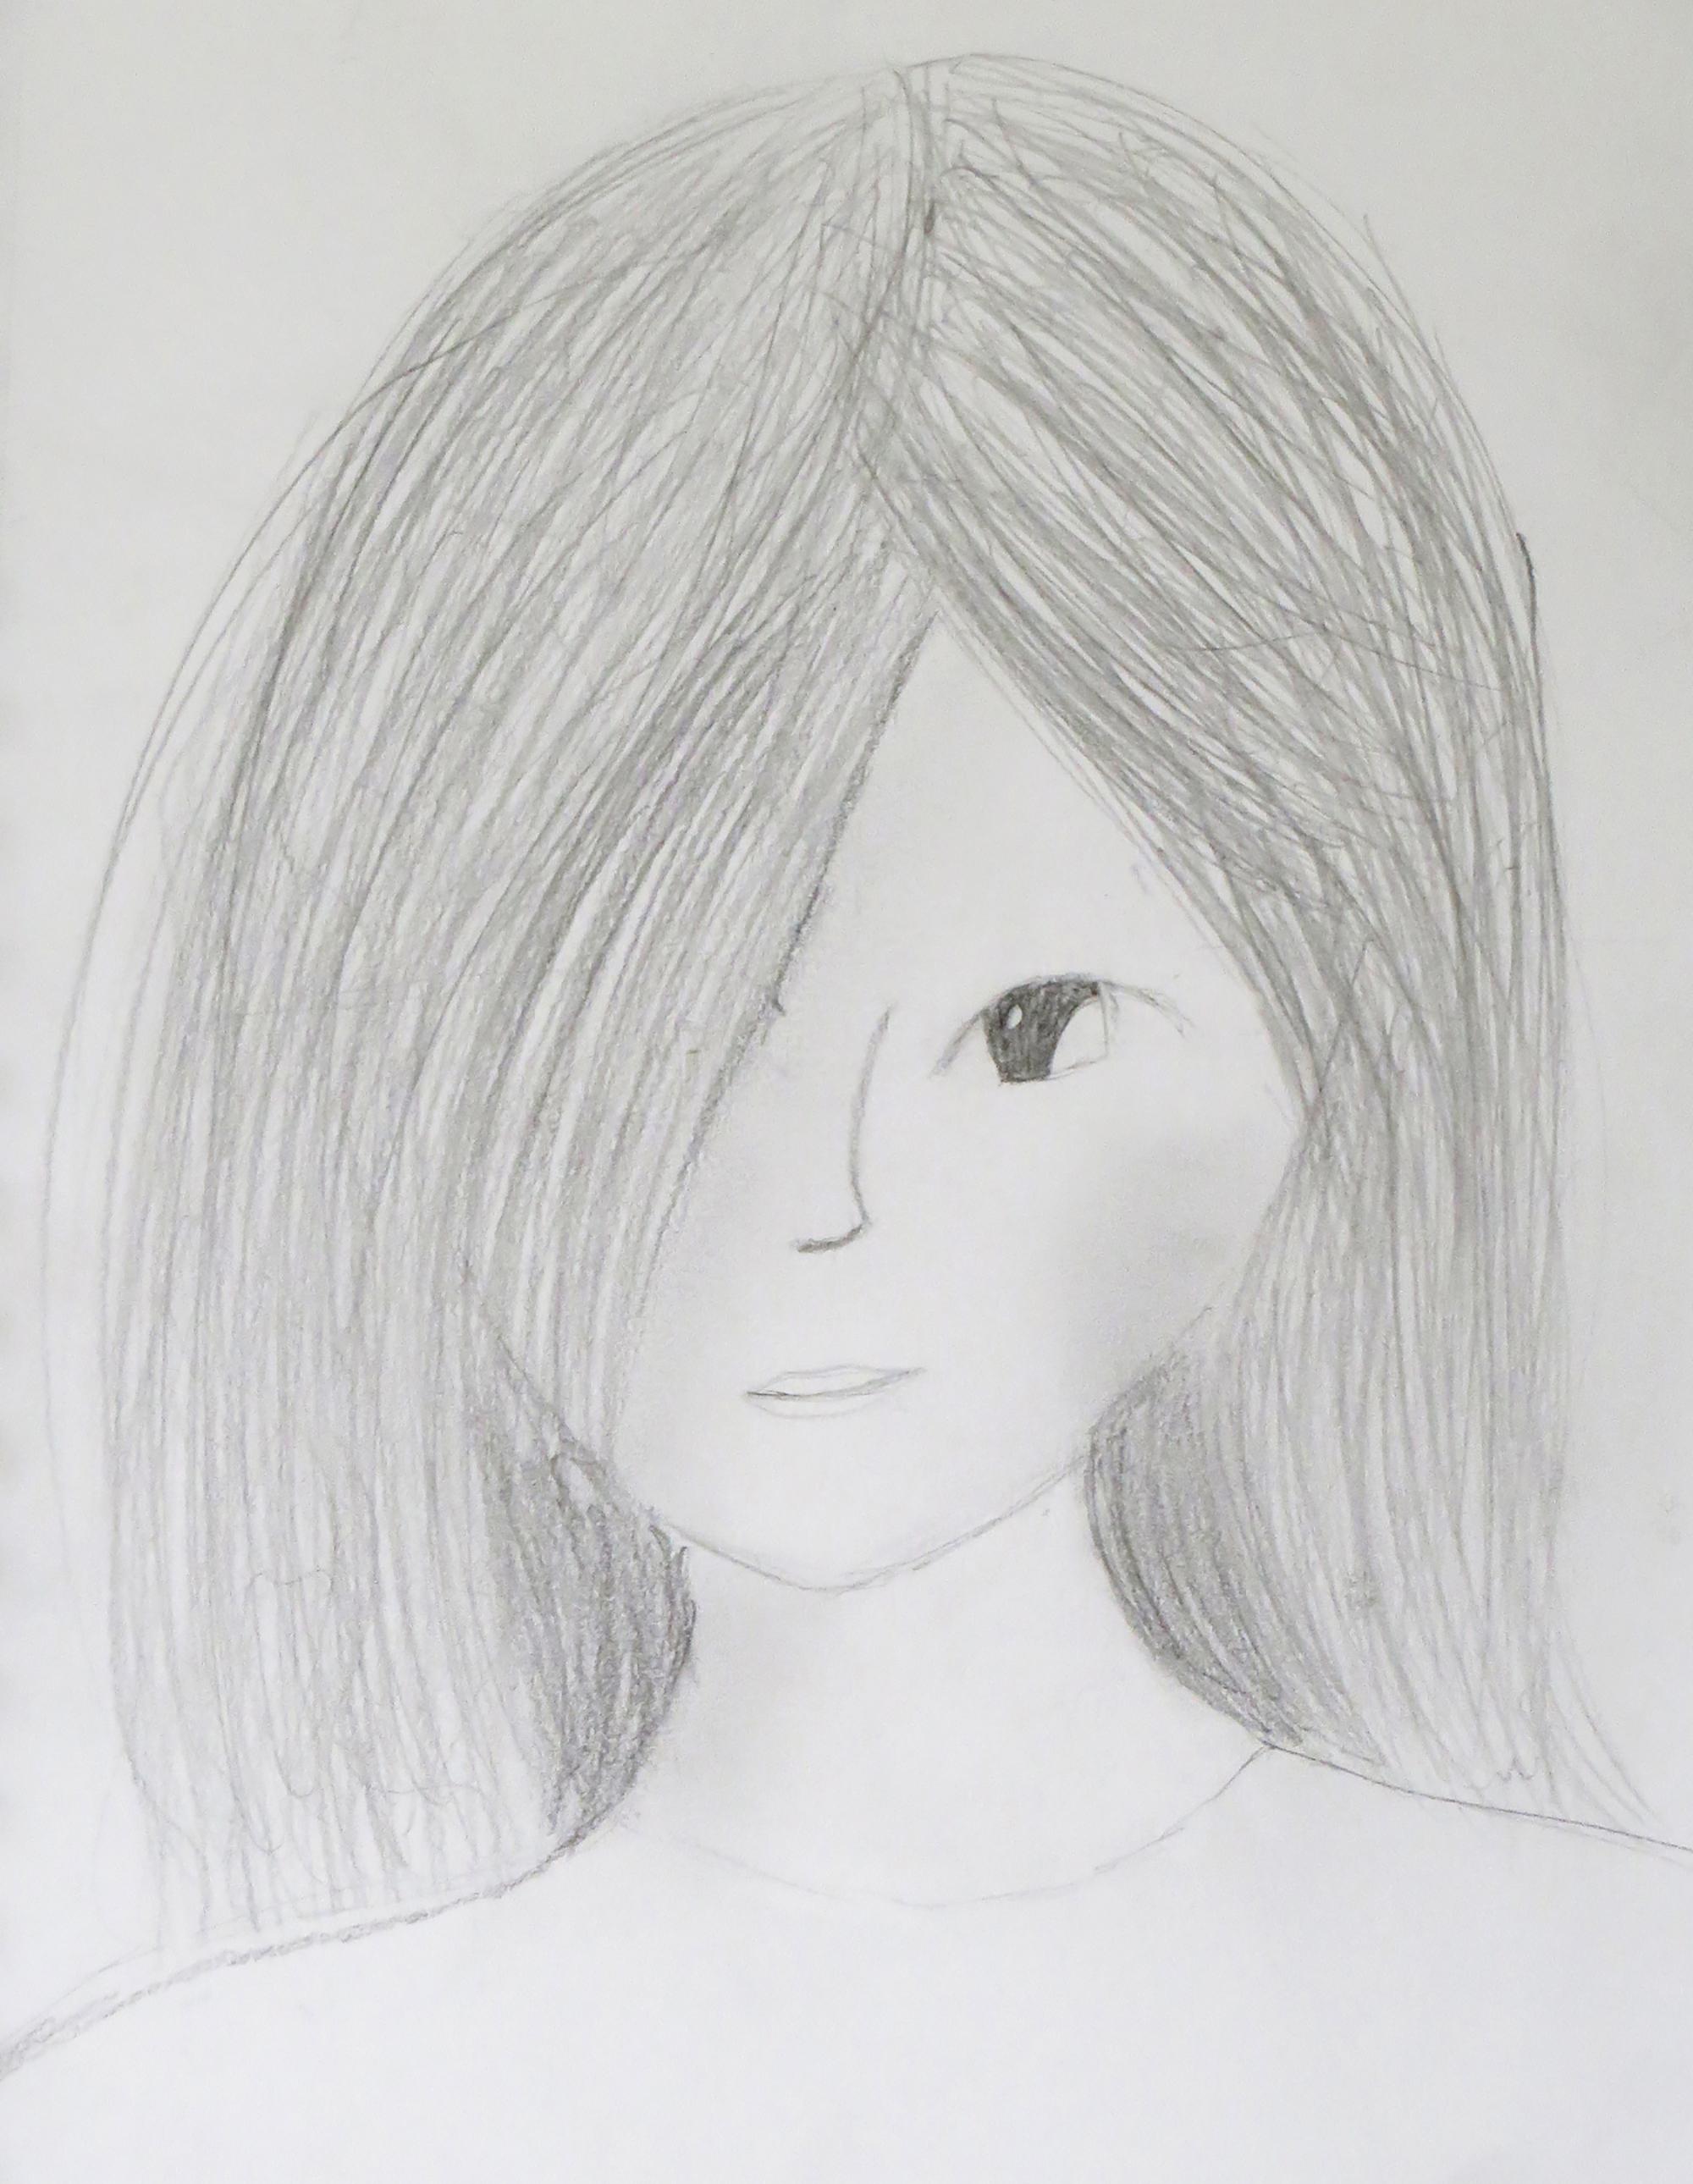 3rd. Alegra Mata, Twilight